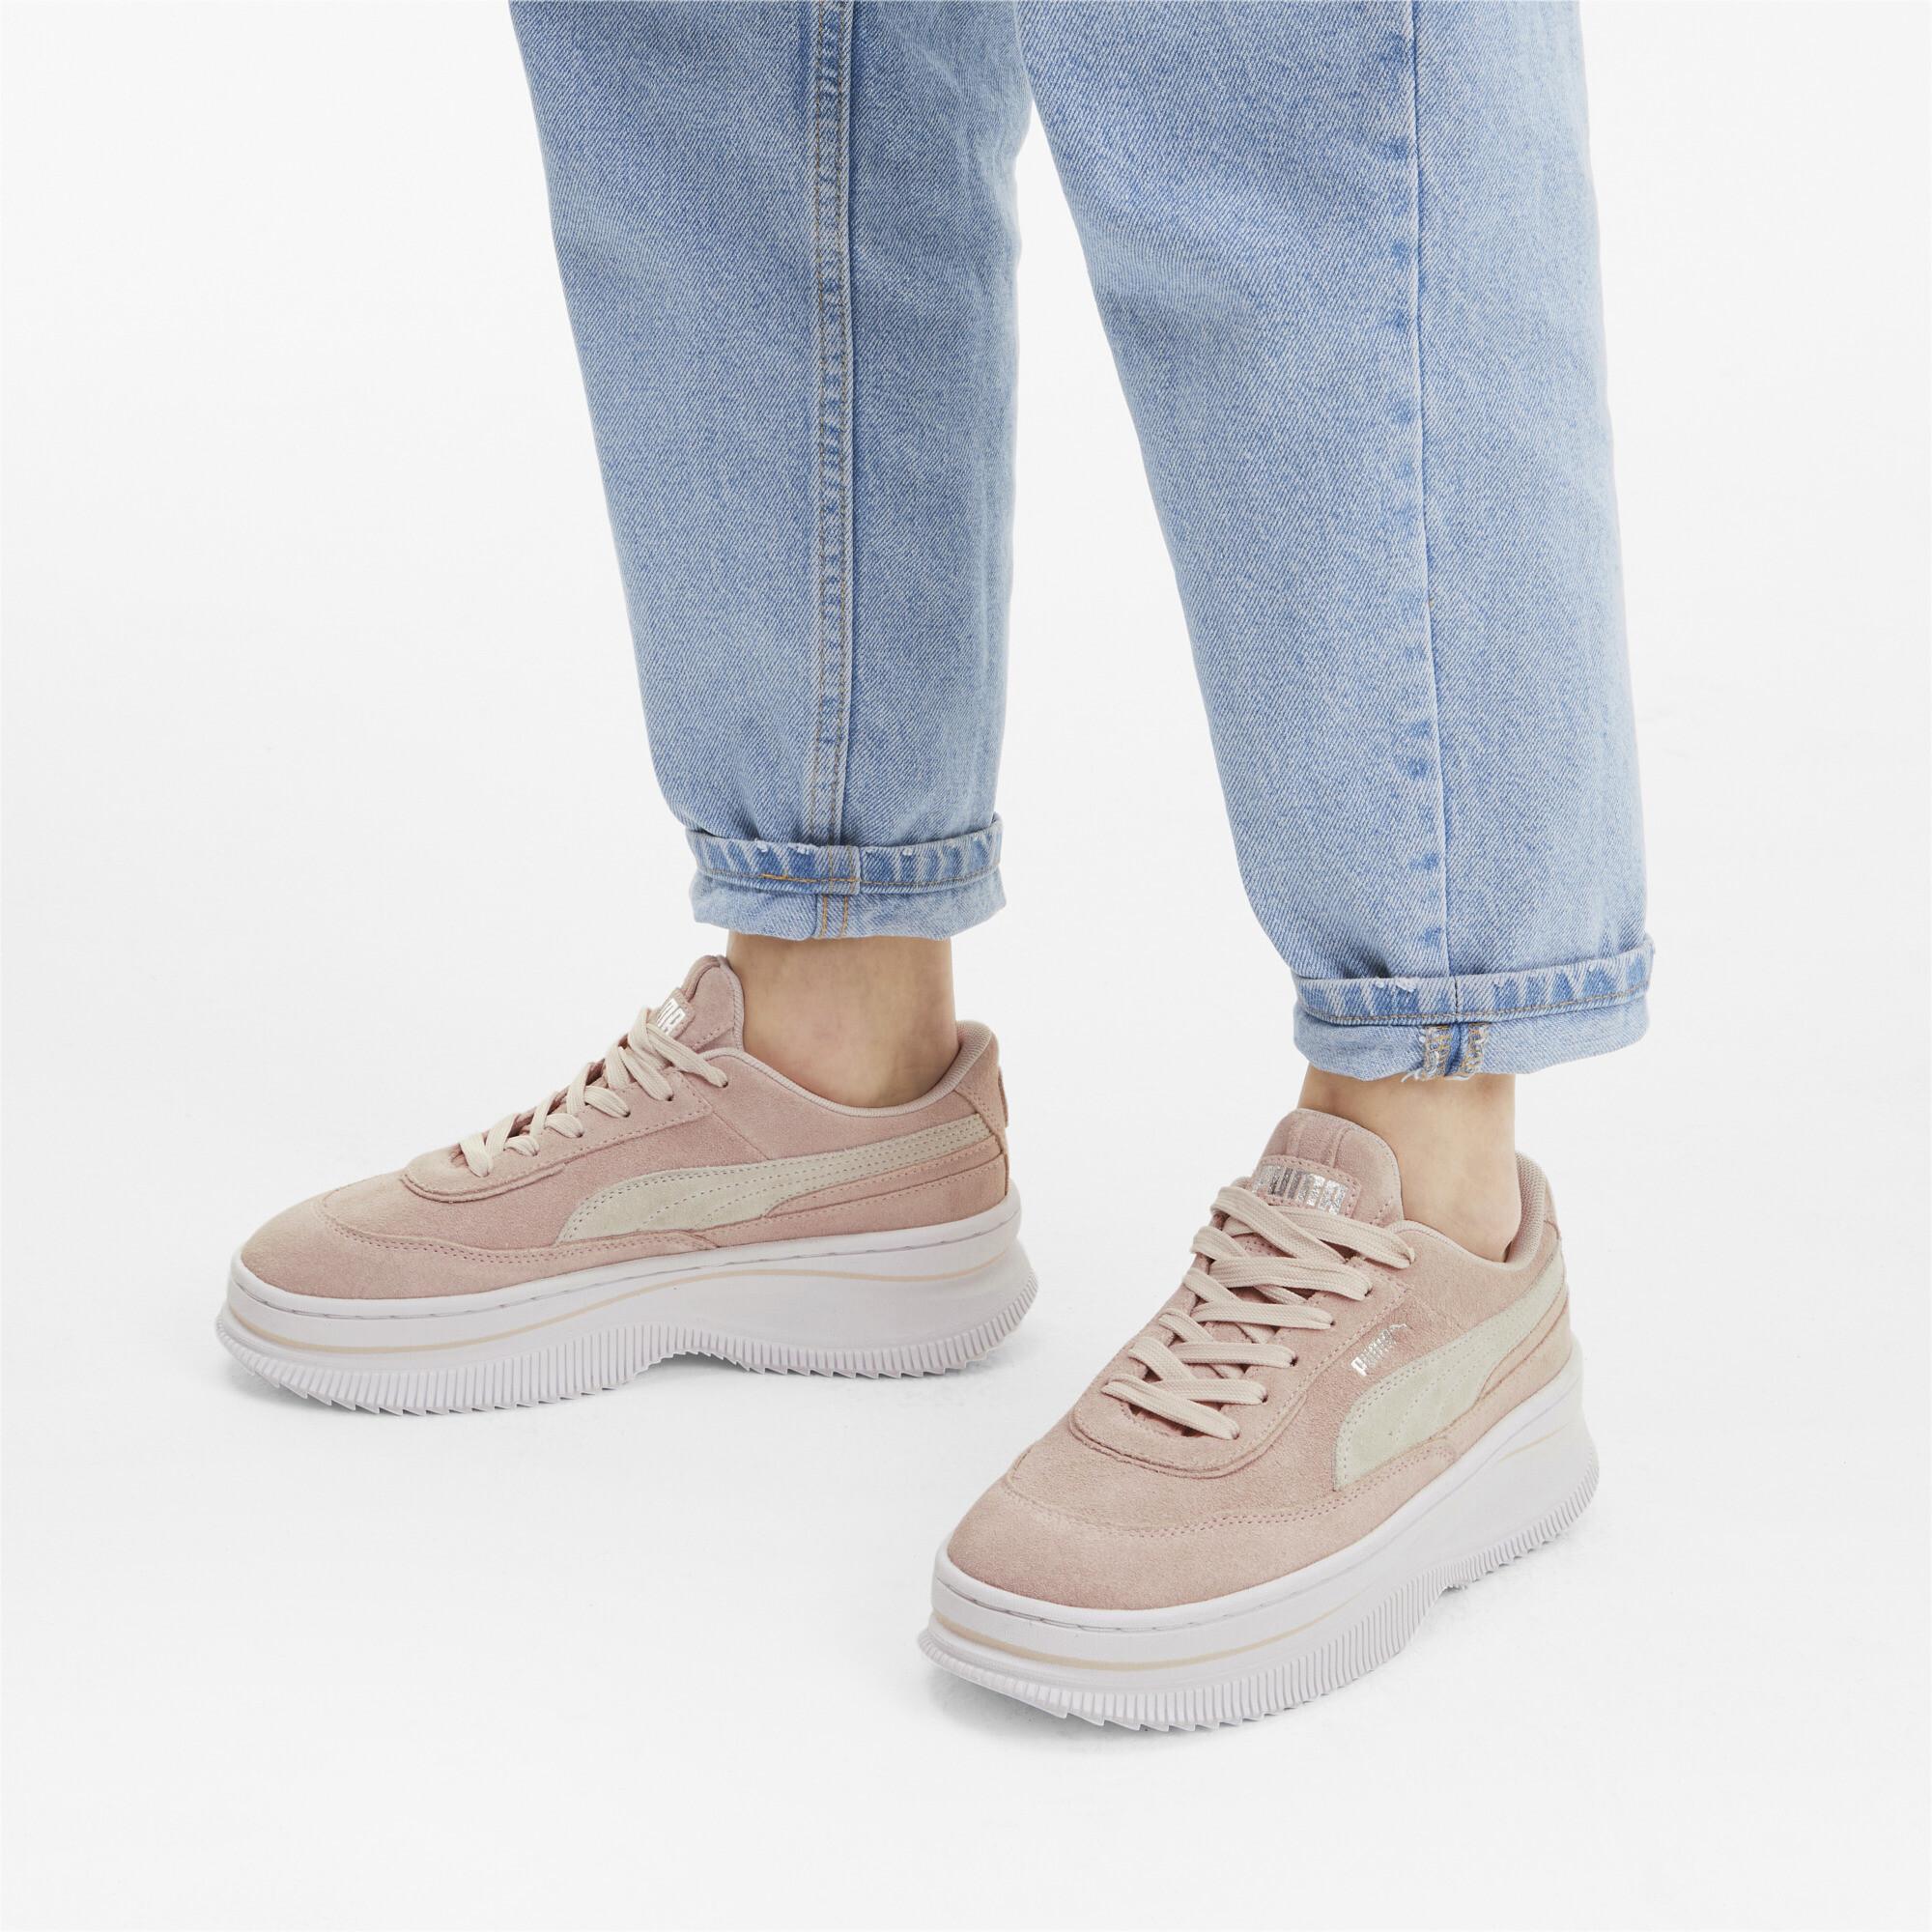 PUMA-Women-039-s-DEVA-Suede-Sneakers thumbnail 12